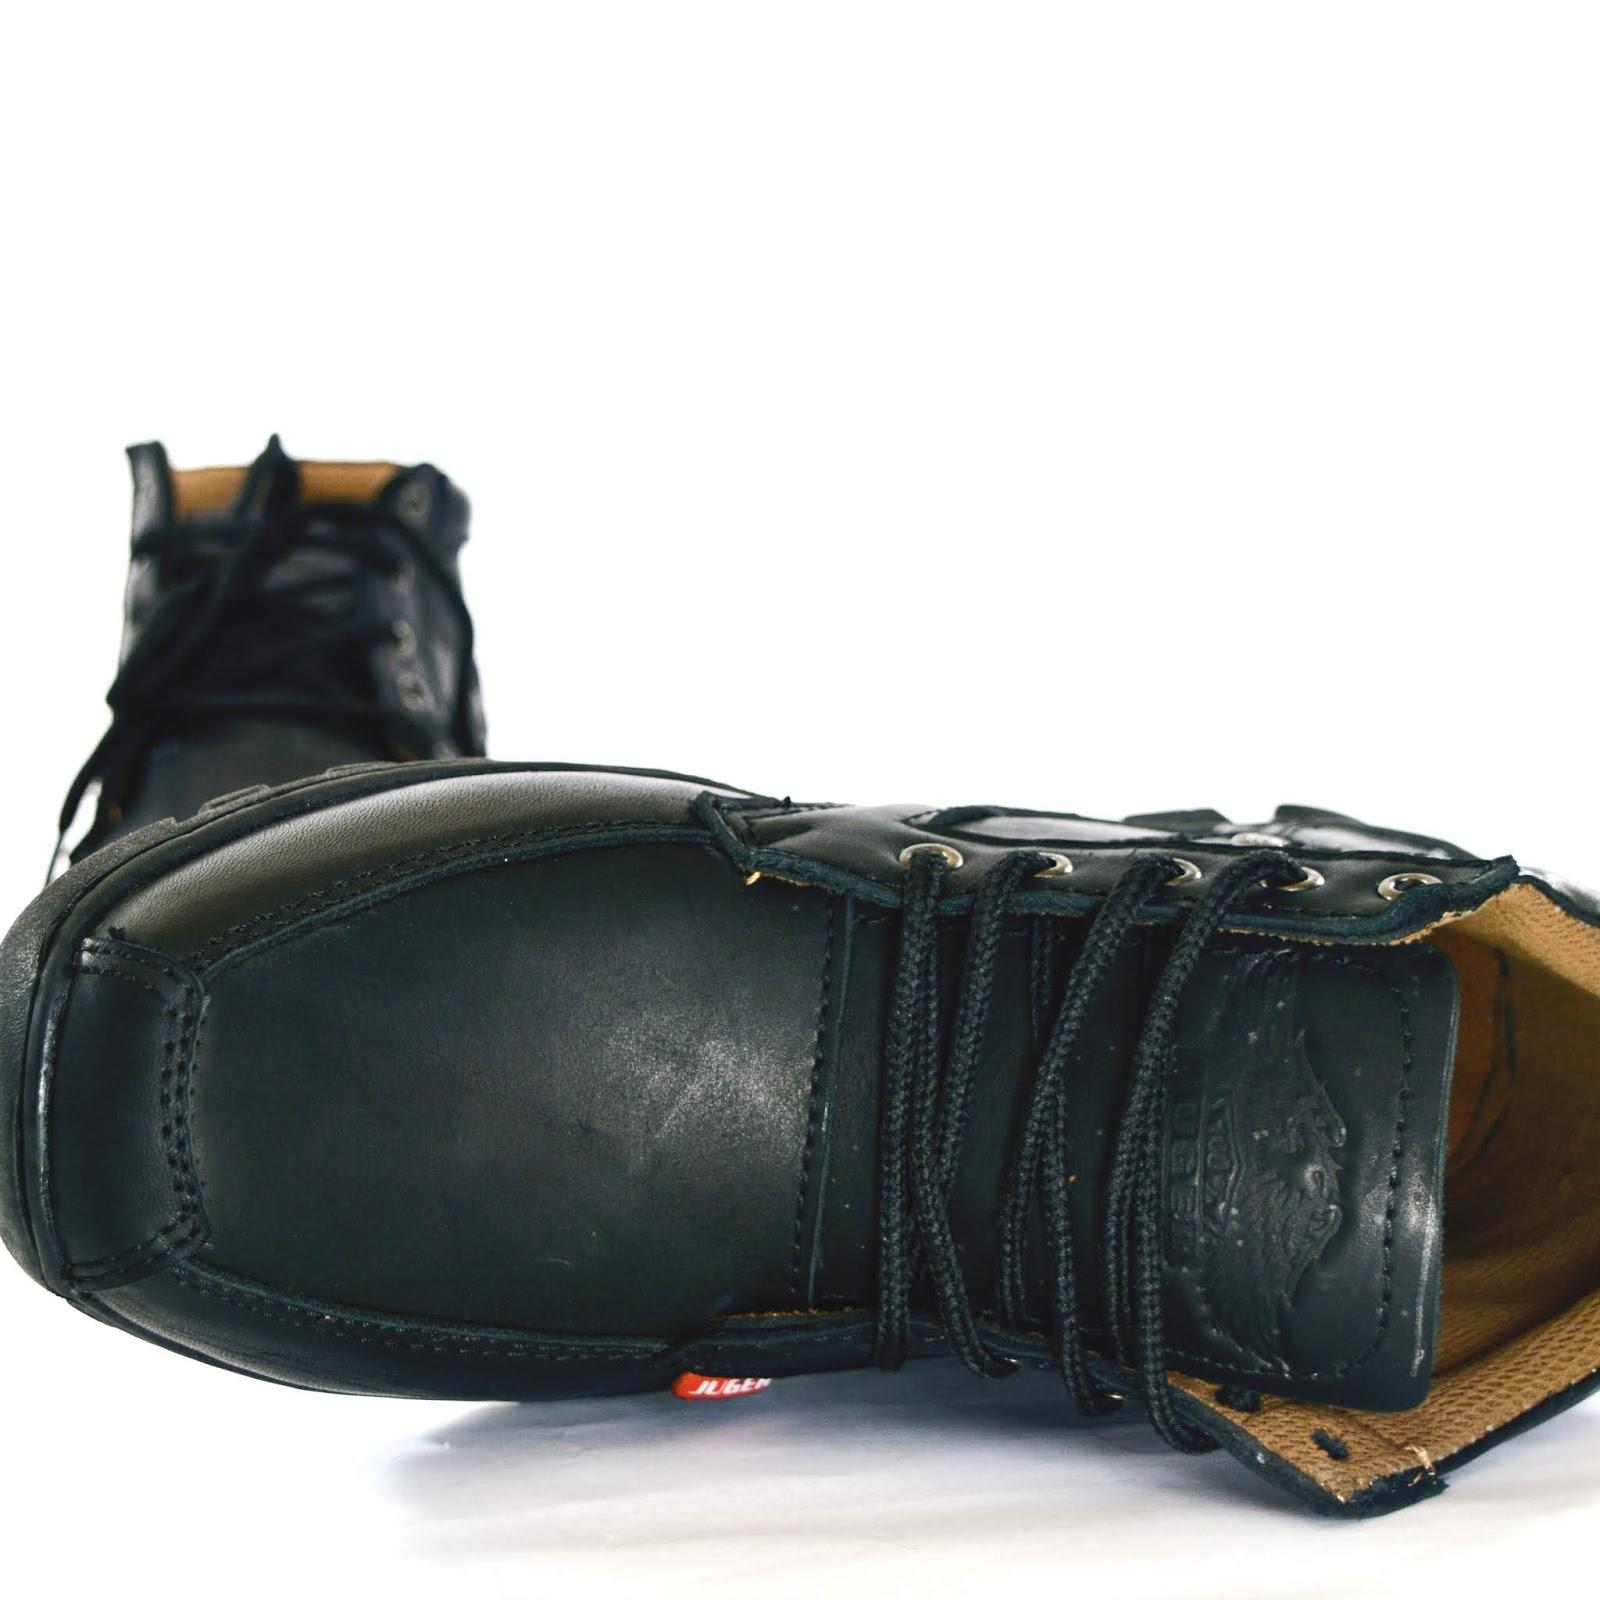 Agen sepatu kulit Bandung  2019 9c75f77abd